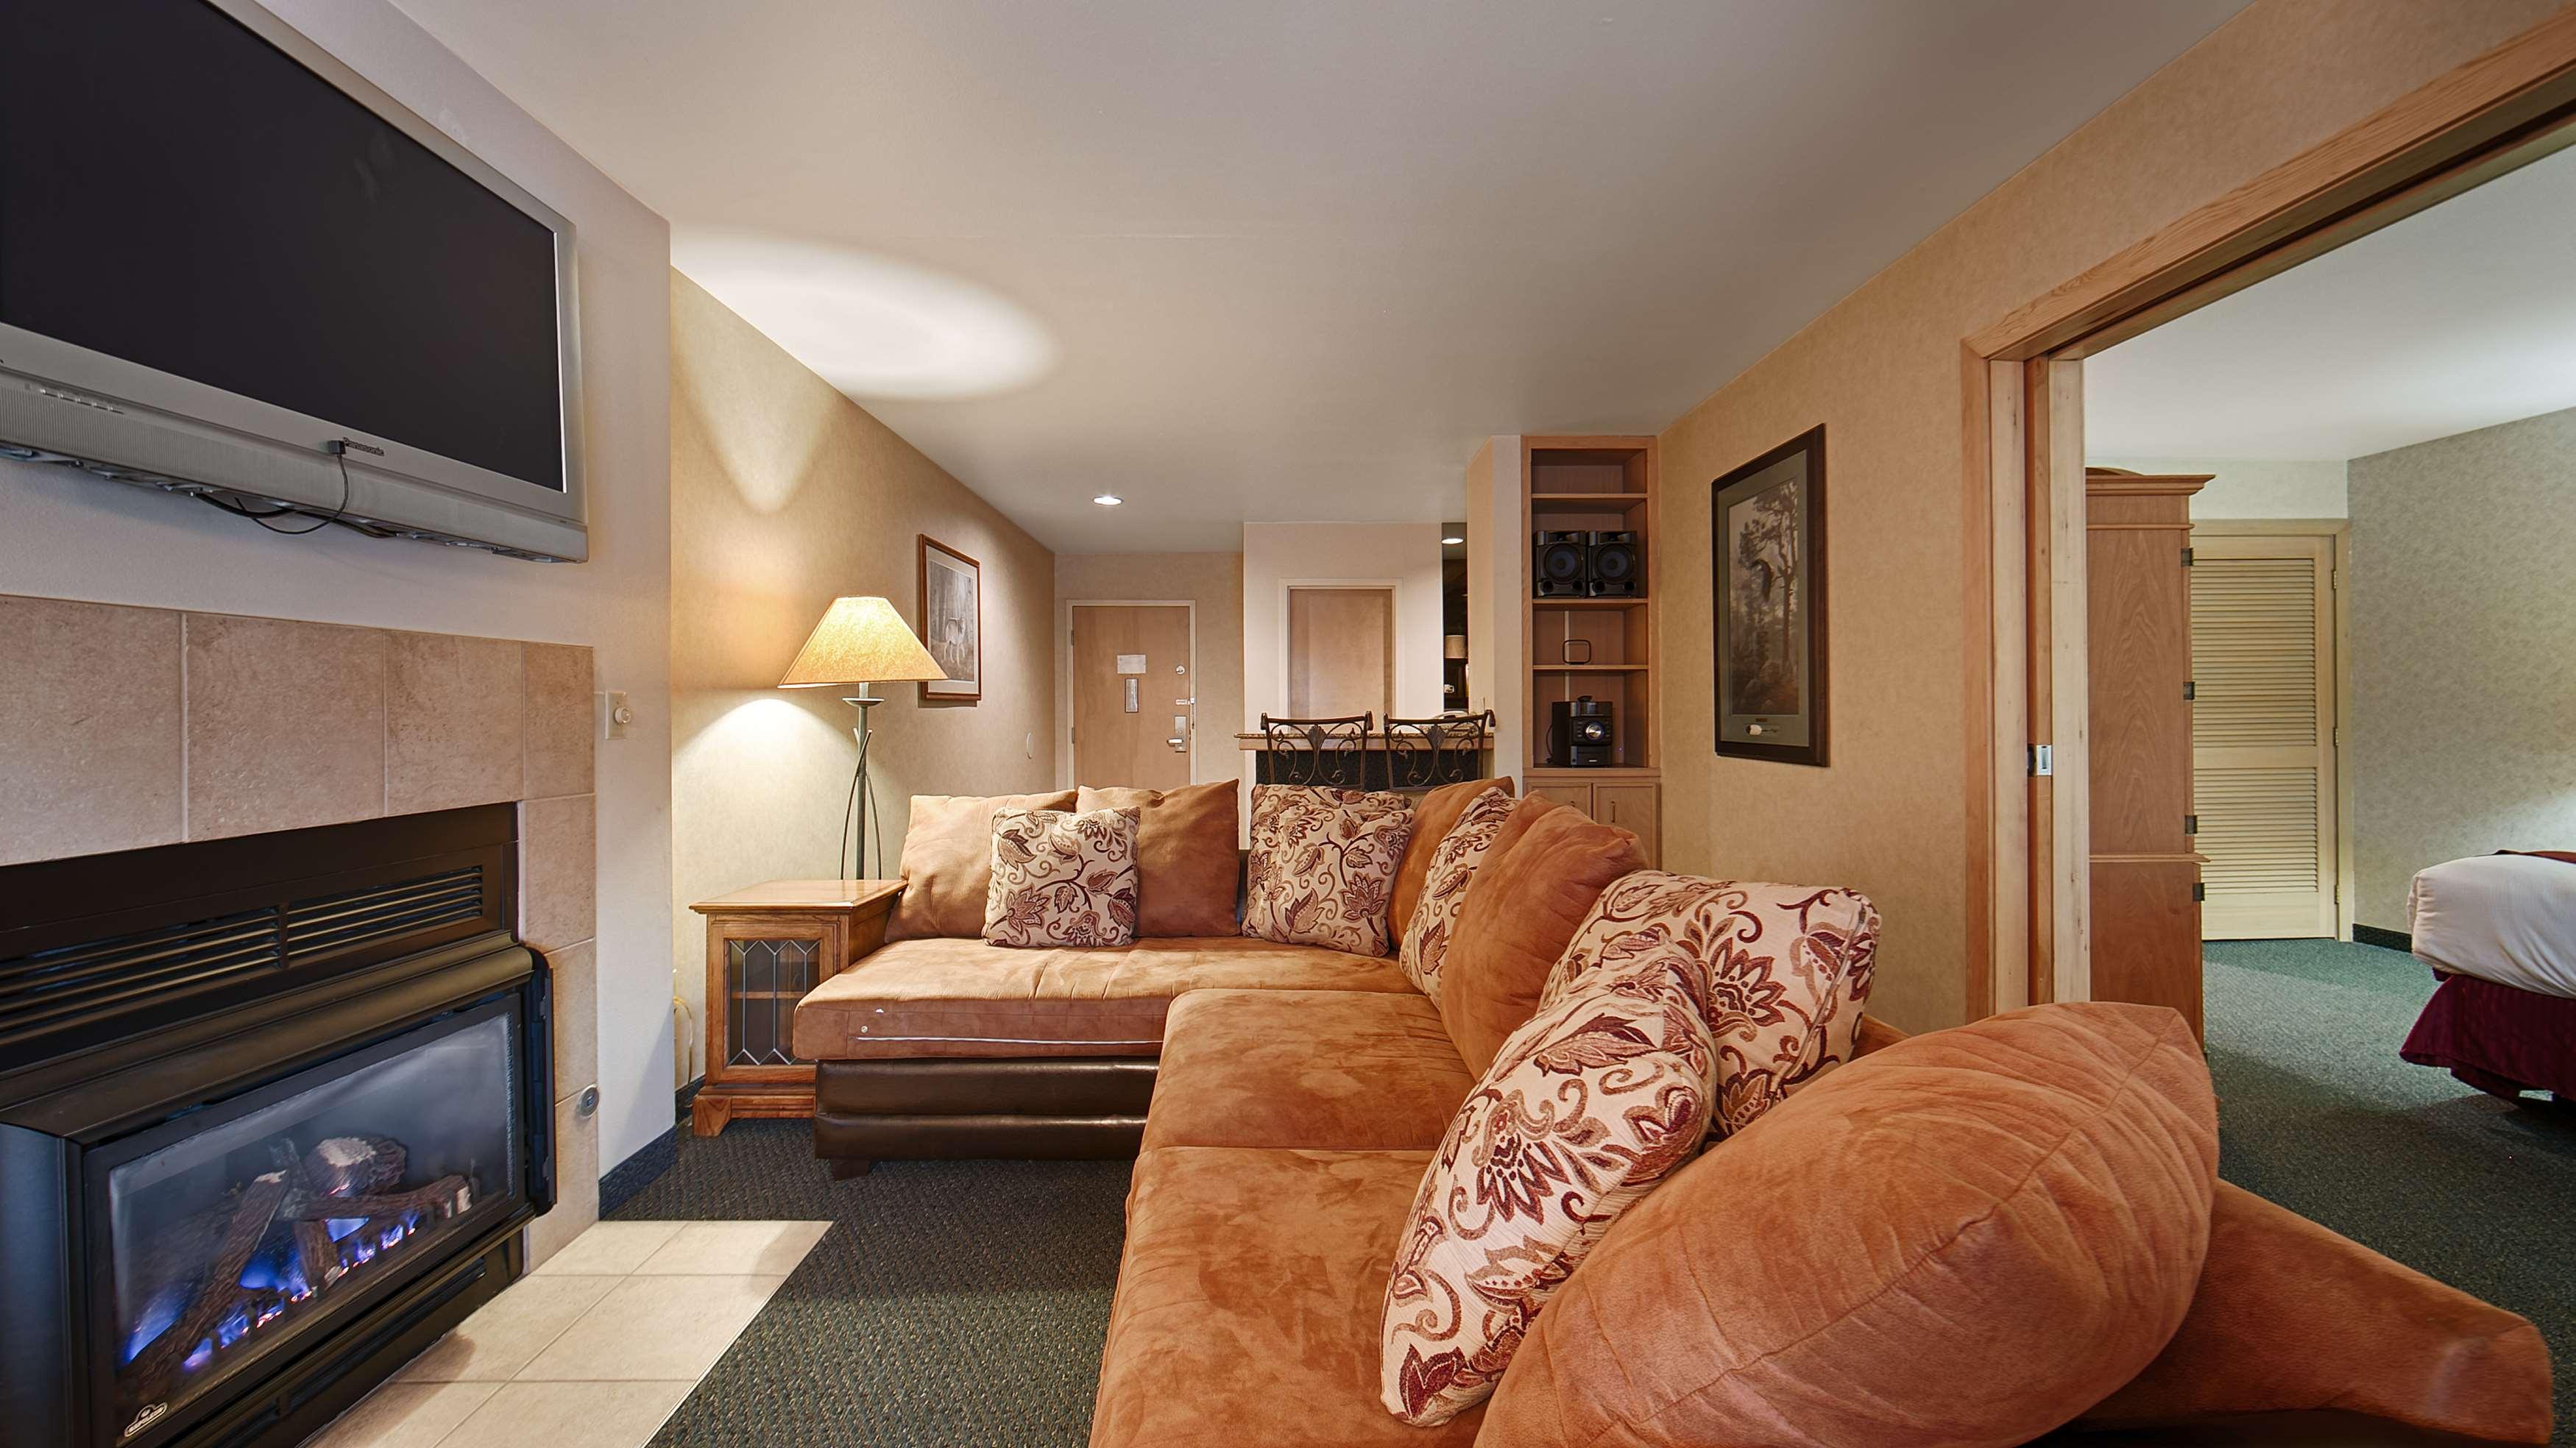 Best Western Plus Kootenai River Inn Casino & Spa image 6